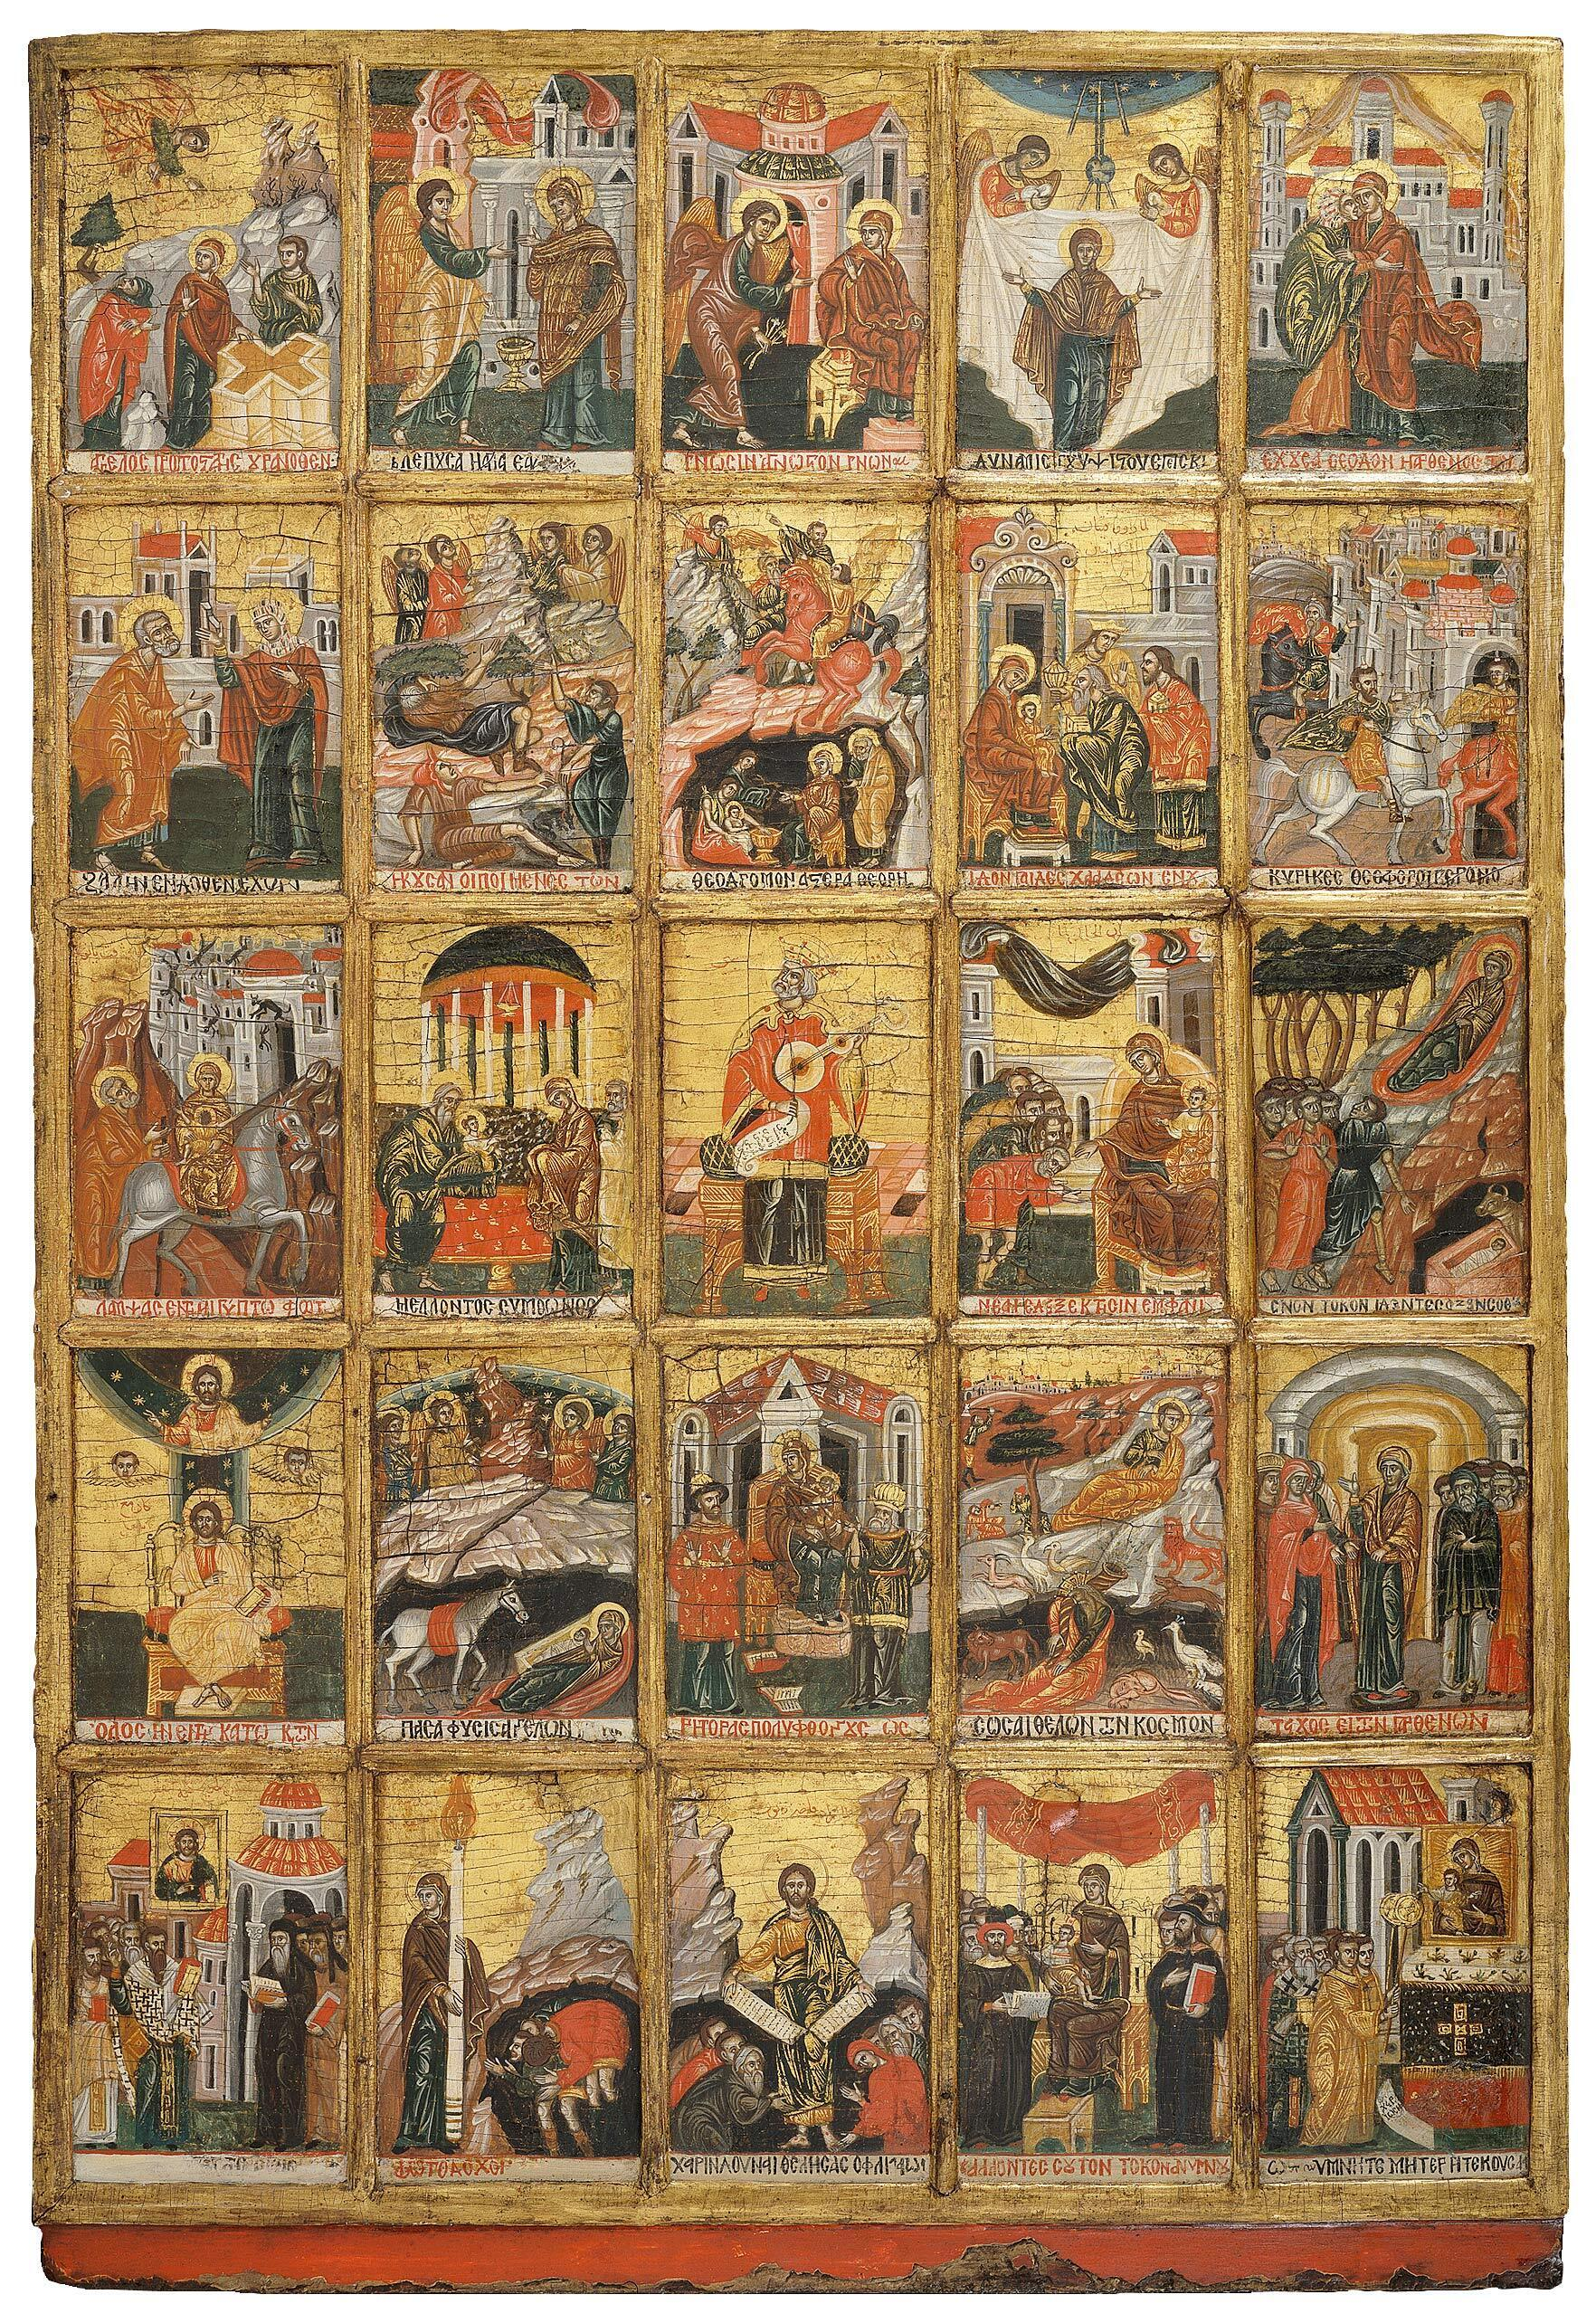 Hymne acathiste. Yûsuf al-Musawwir, Alep, entre 1650 et 1667. Tempera sur bois. Collection George Antaki, Londres.